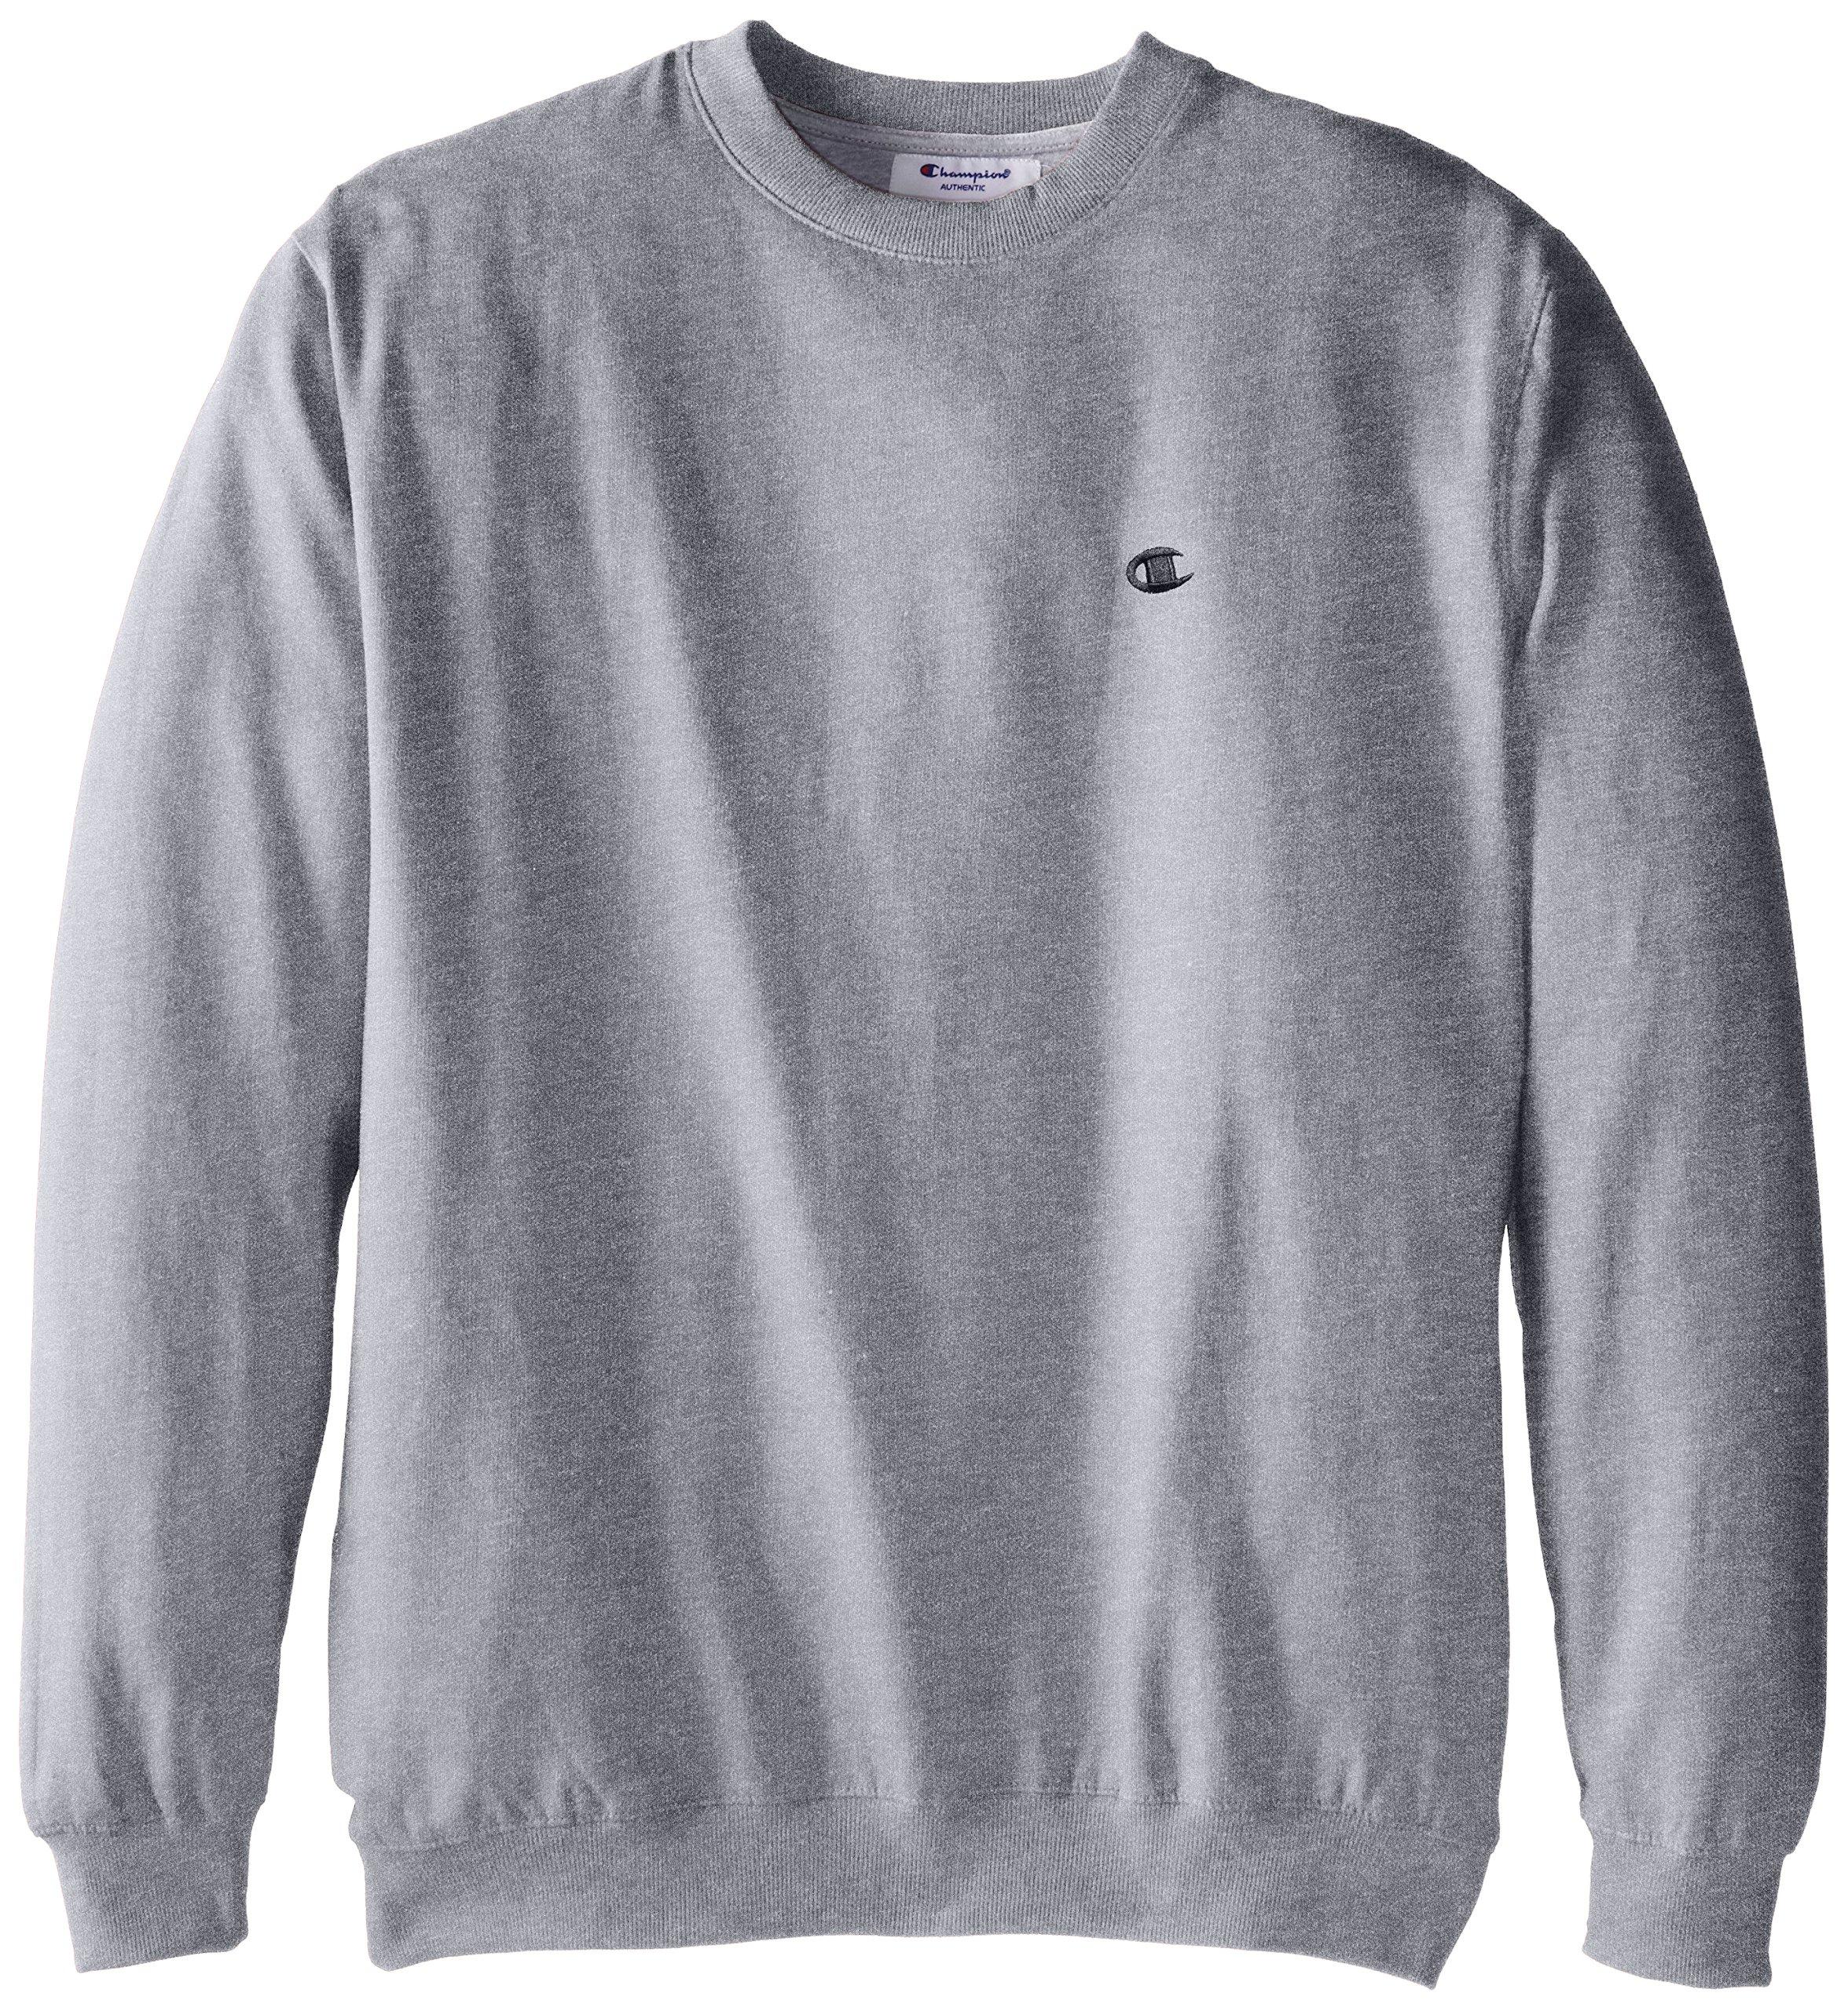 Champion Men's Big-Tall Fleece Crew Sweatshirt, Grey Heather, 4X/Tall